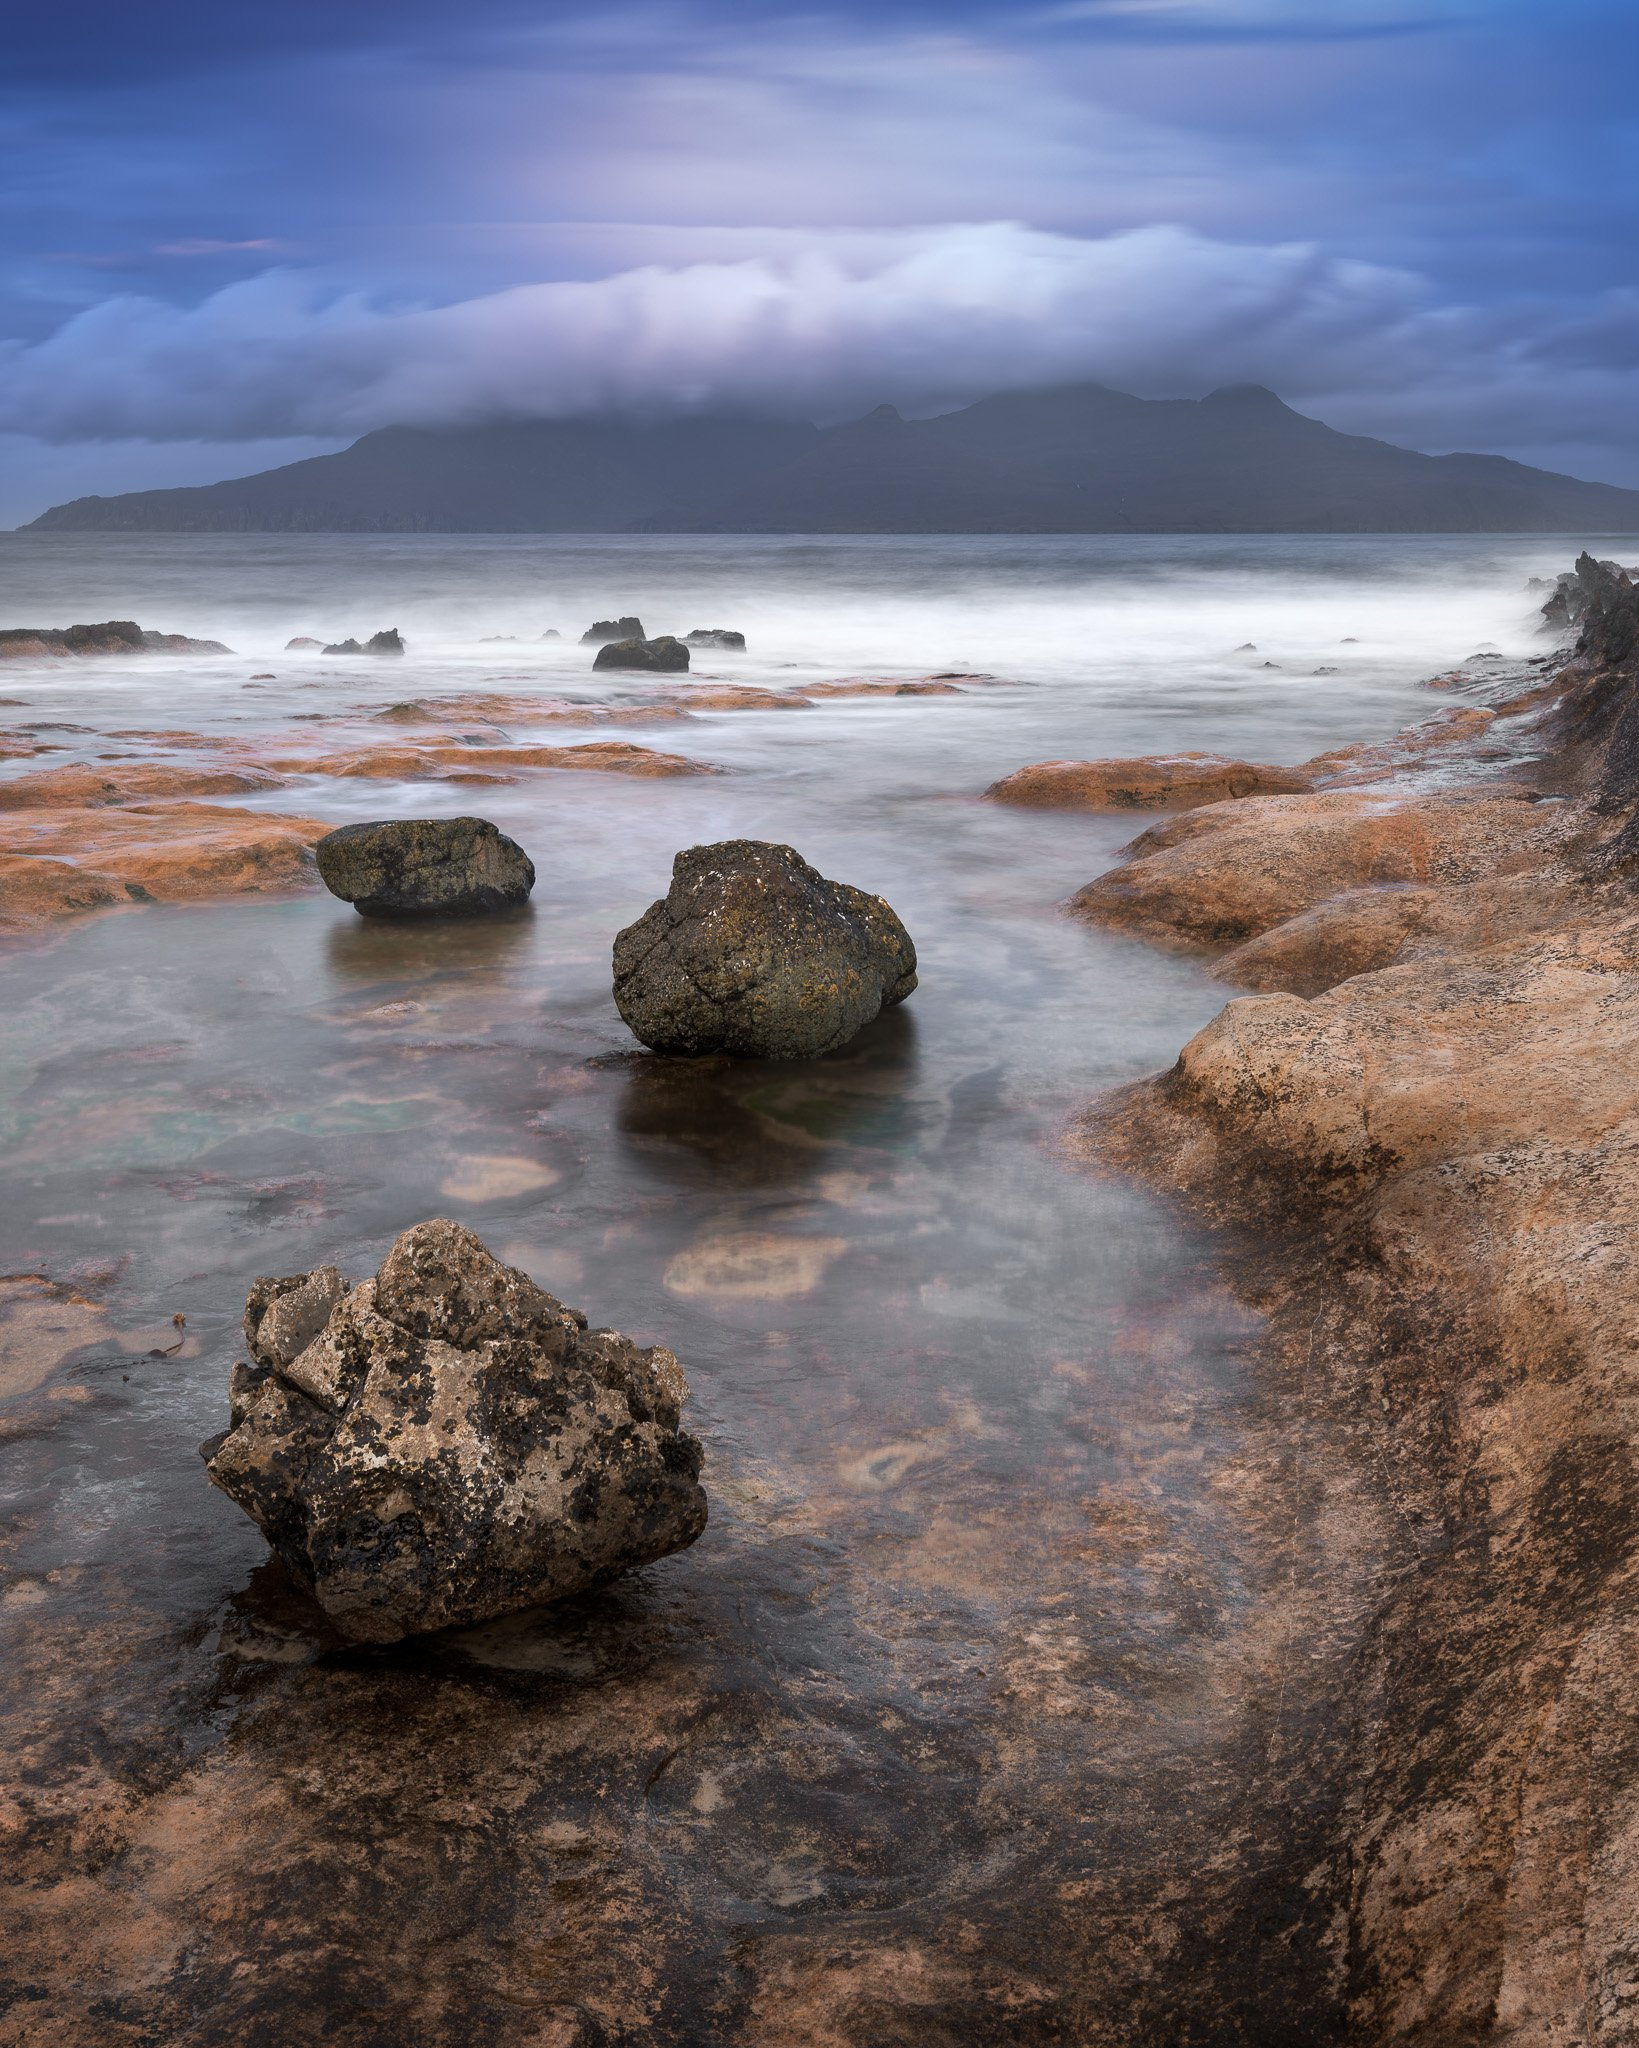 bay, beach, beautiful, blue, cliff, clouds, coast, coastal, dawn, eigg, europe, golden, highlands, island, isle, kingdom, landscape, lochaber, morning, nature, ocean, overcast, pebbles, rain, rainy, rhum, rock, rocky, rum, scenic, scotland, scottish, sea,, anshar